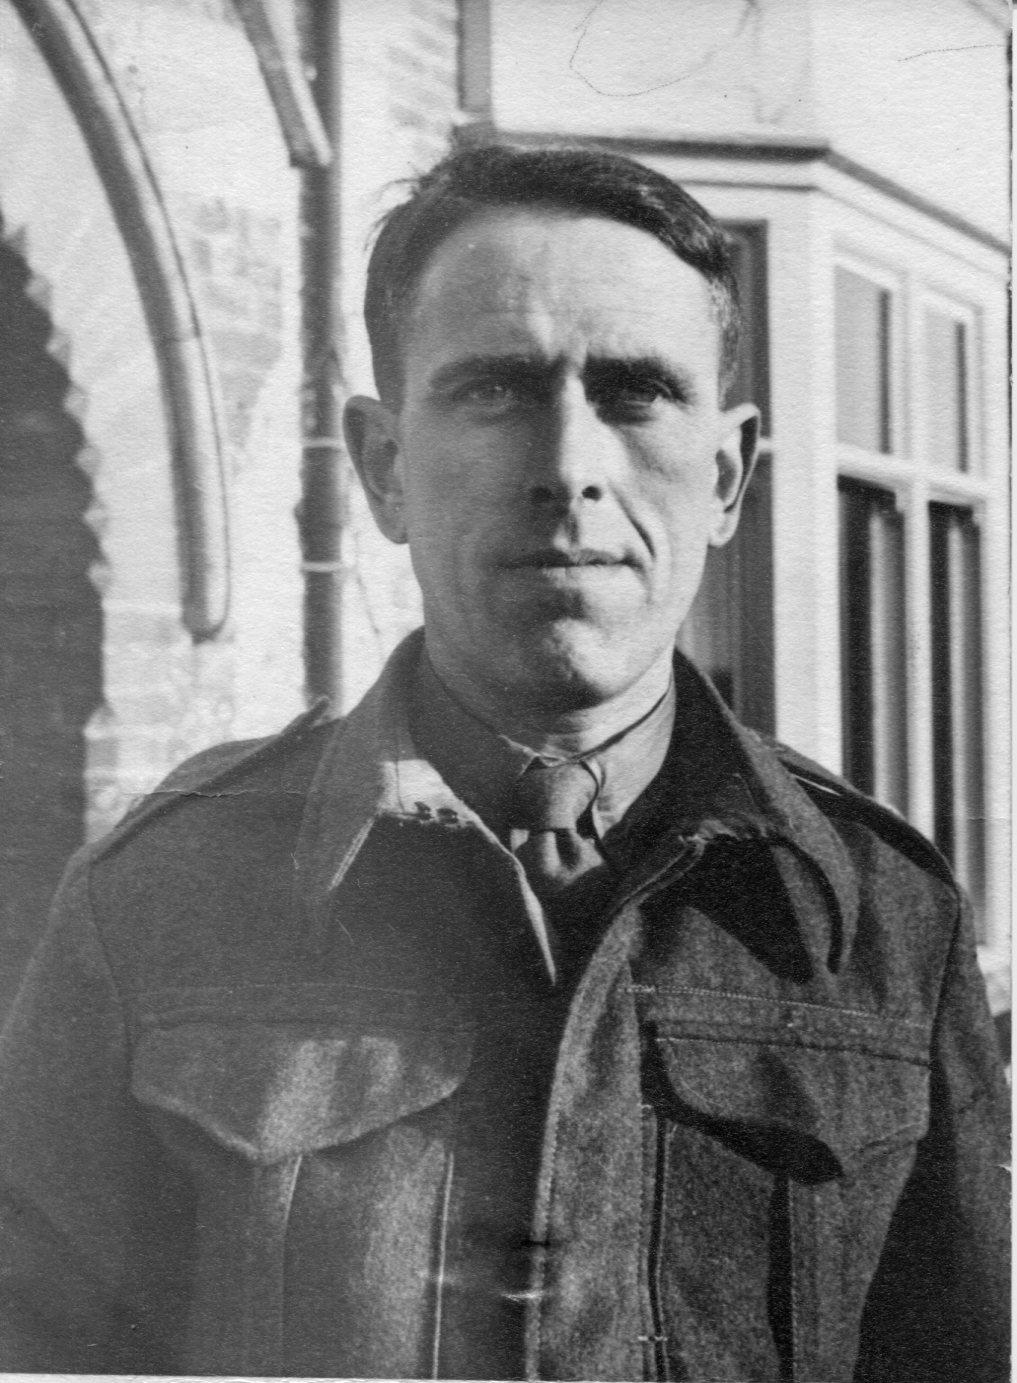 2nd Lt Saunders